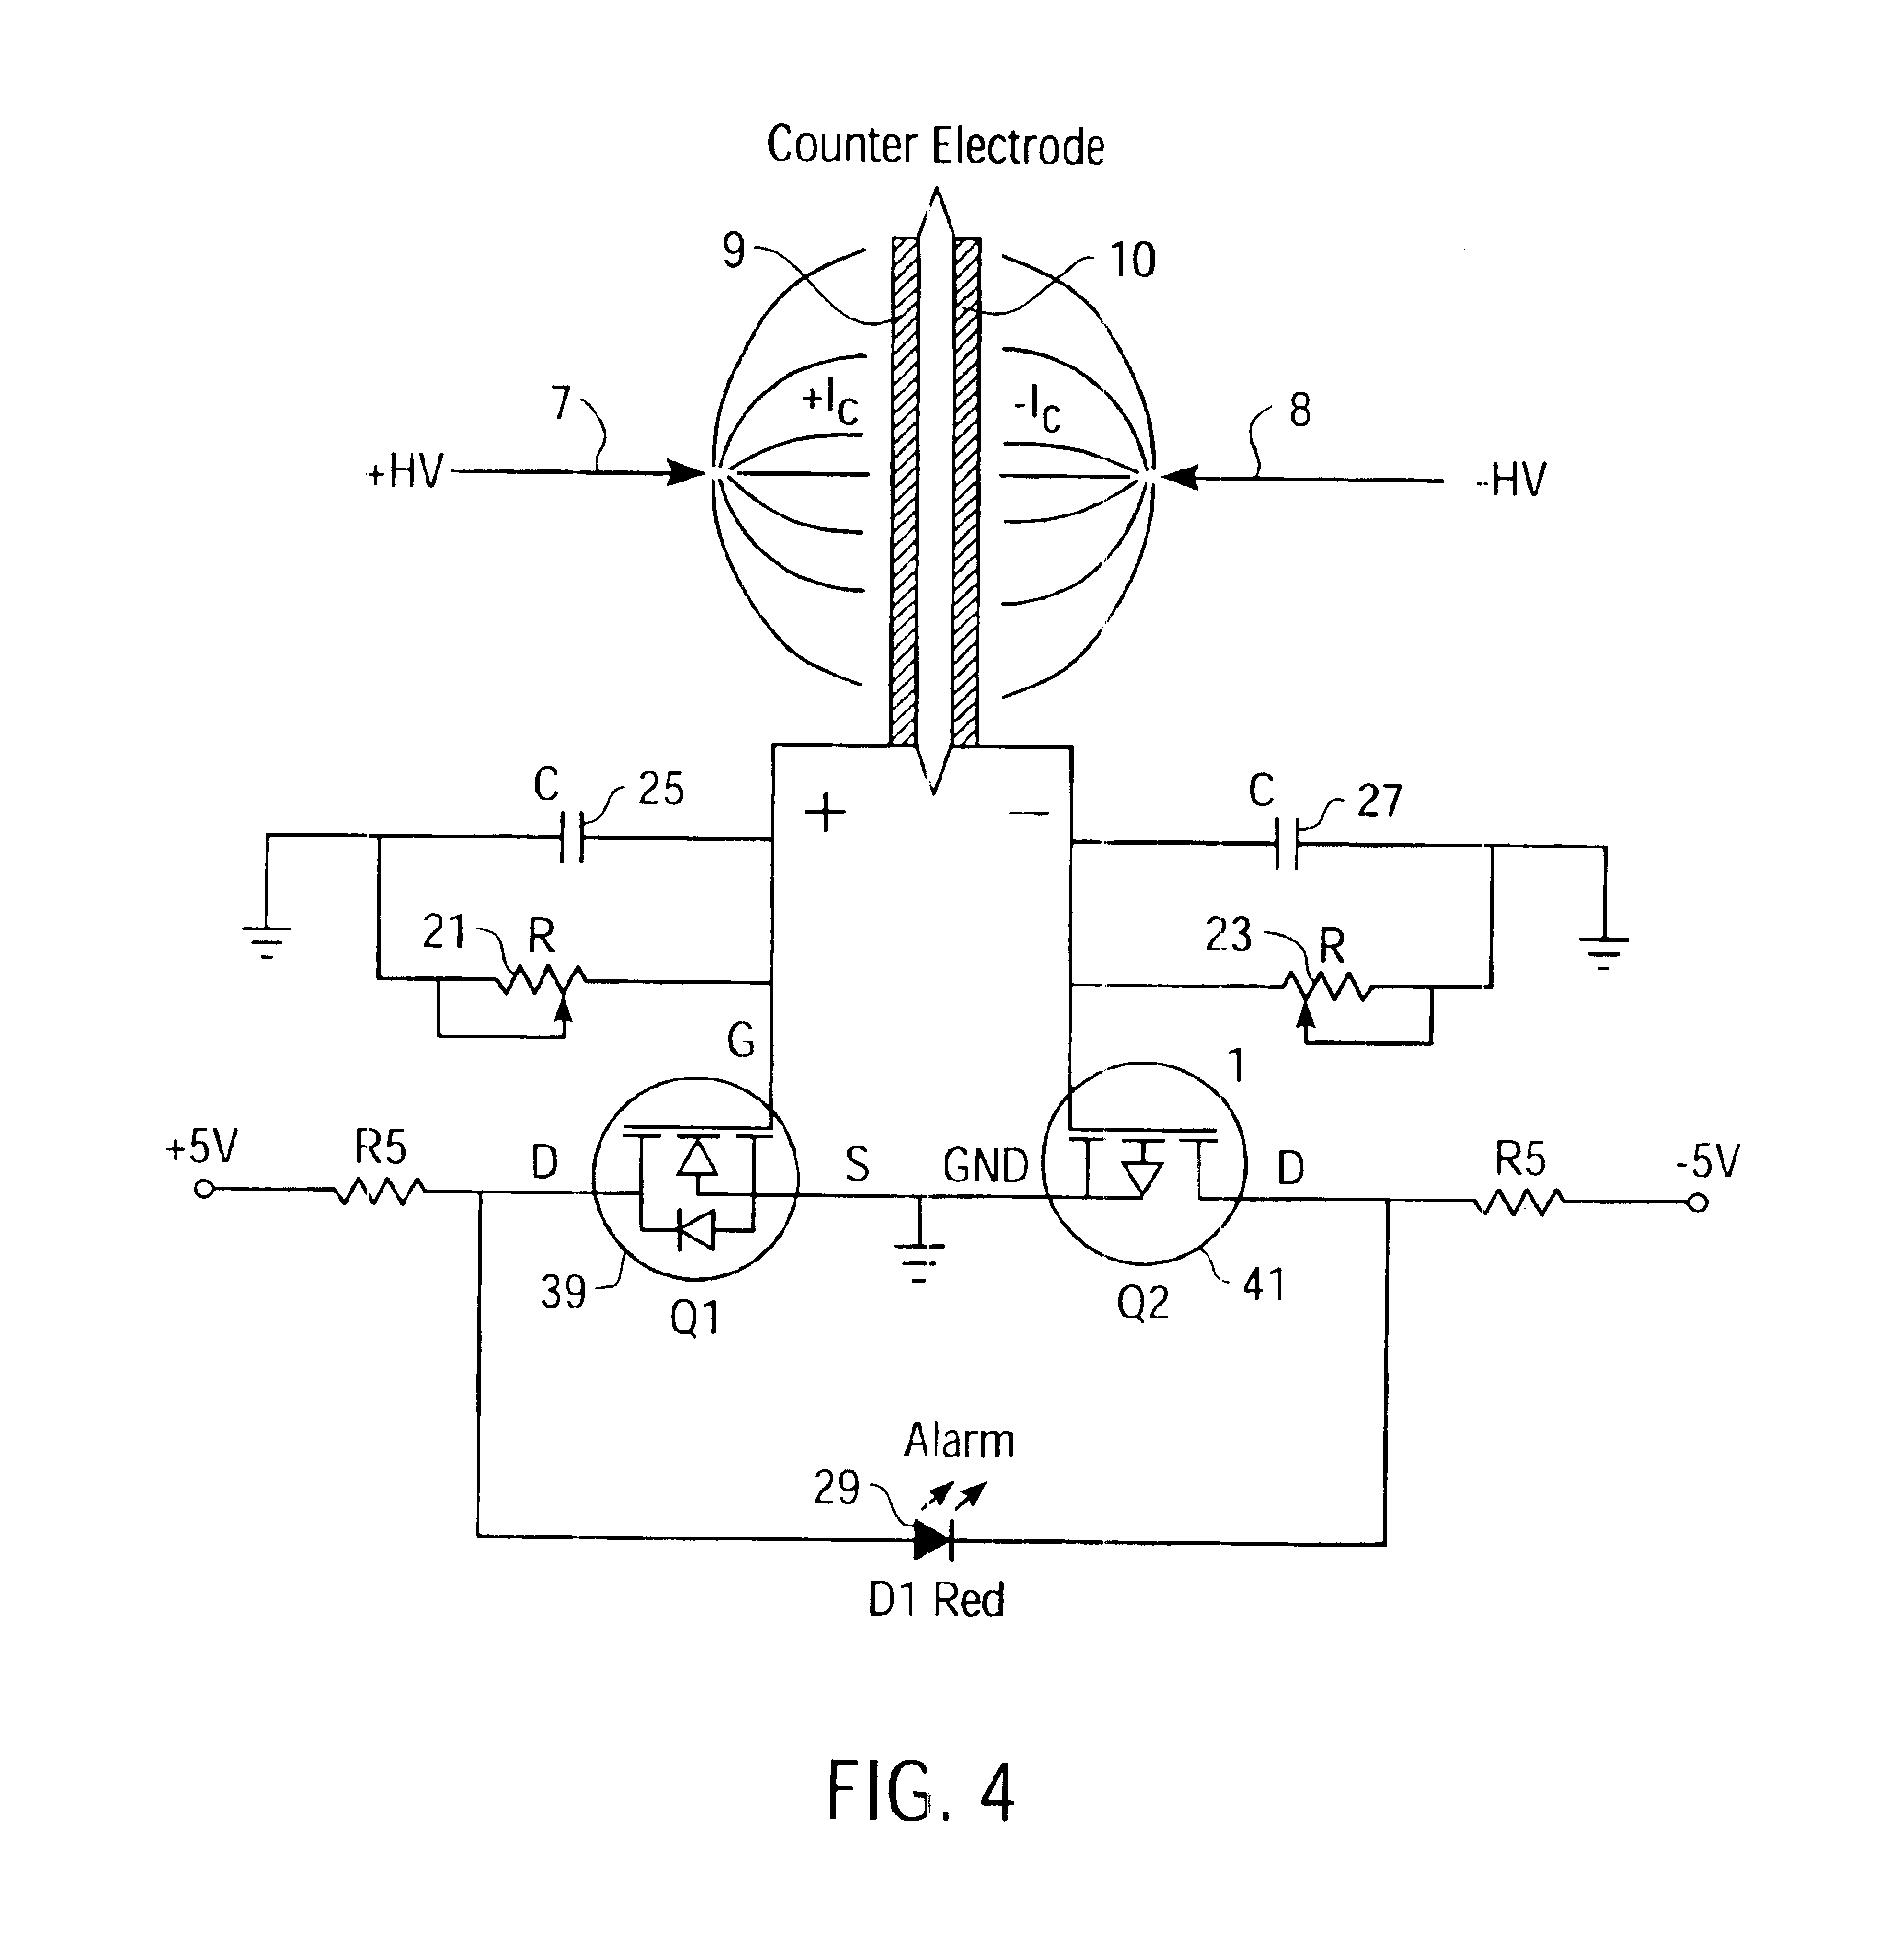 ionizer transformer dc power supply wiring diagram wire center u2022 rh aktivagroup co Wiring-Diagram Power Supply Out Let Wiring-Diagram Power Supply Out Let